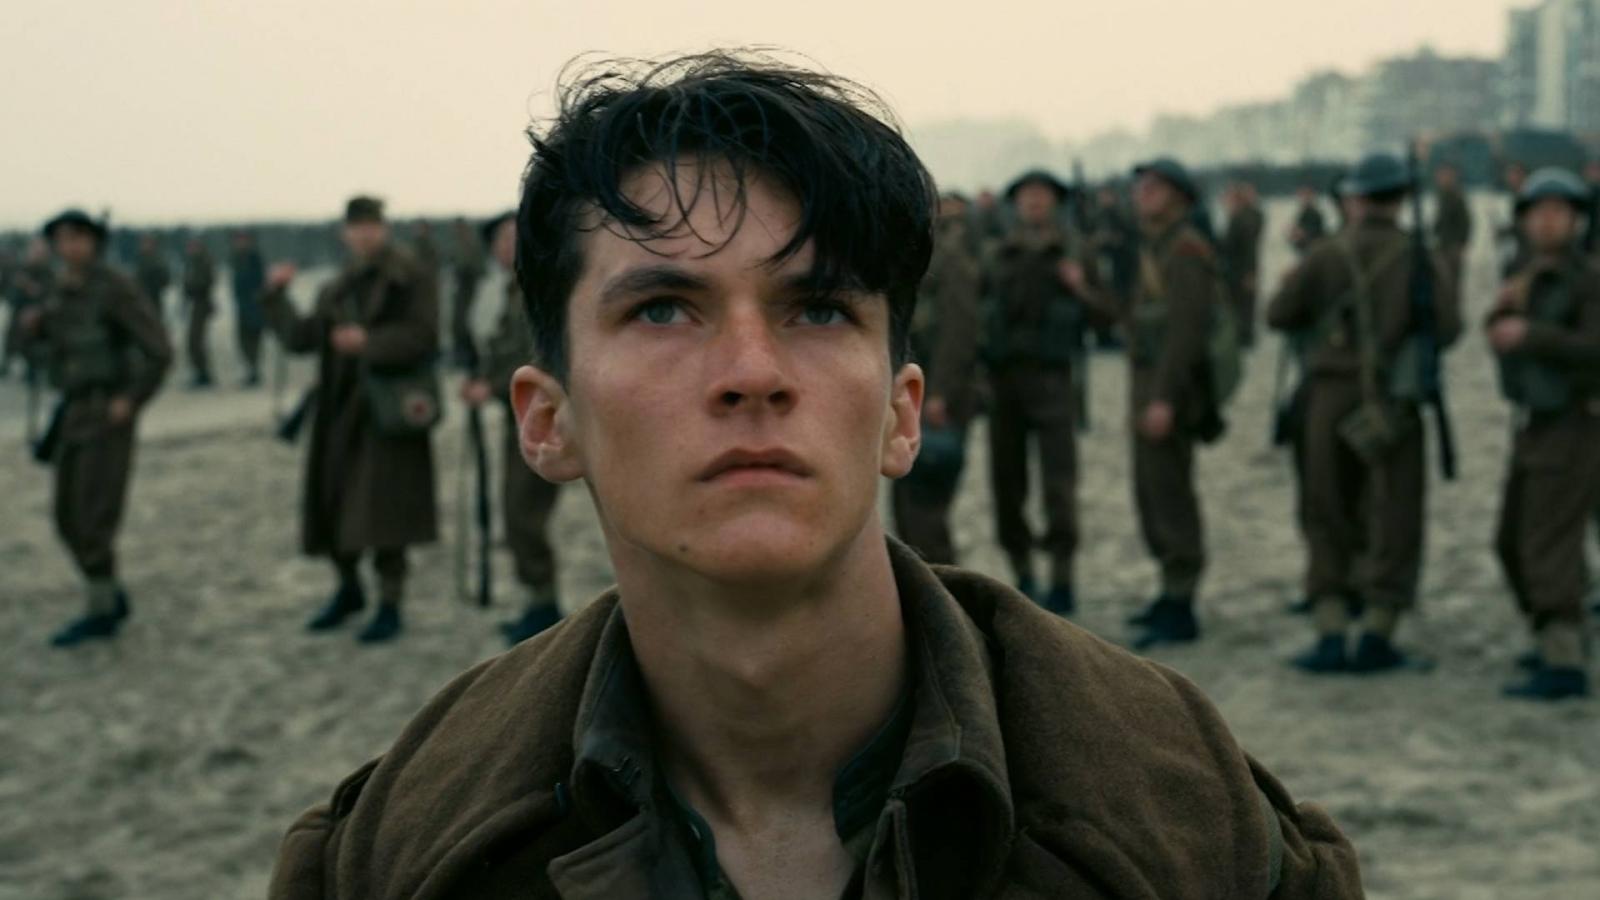 'Dunkirk': IMAX Featurette